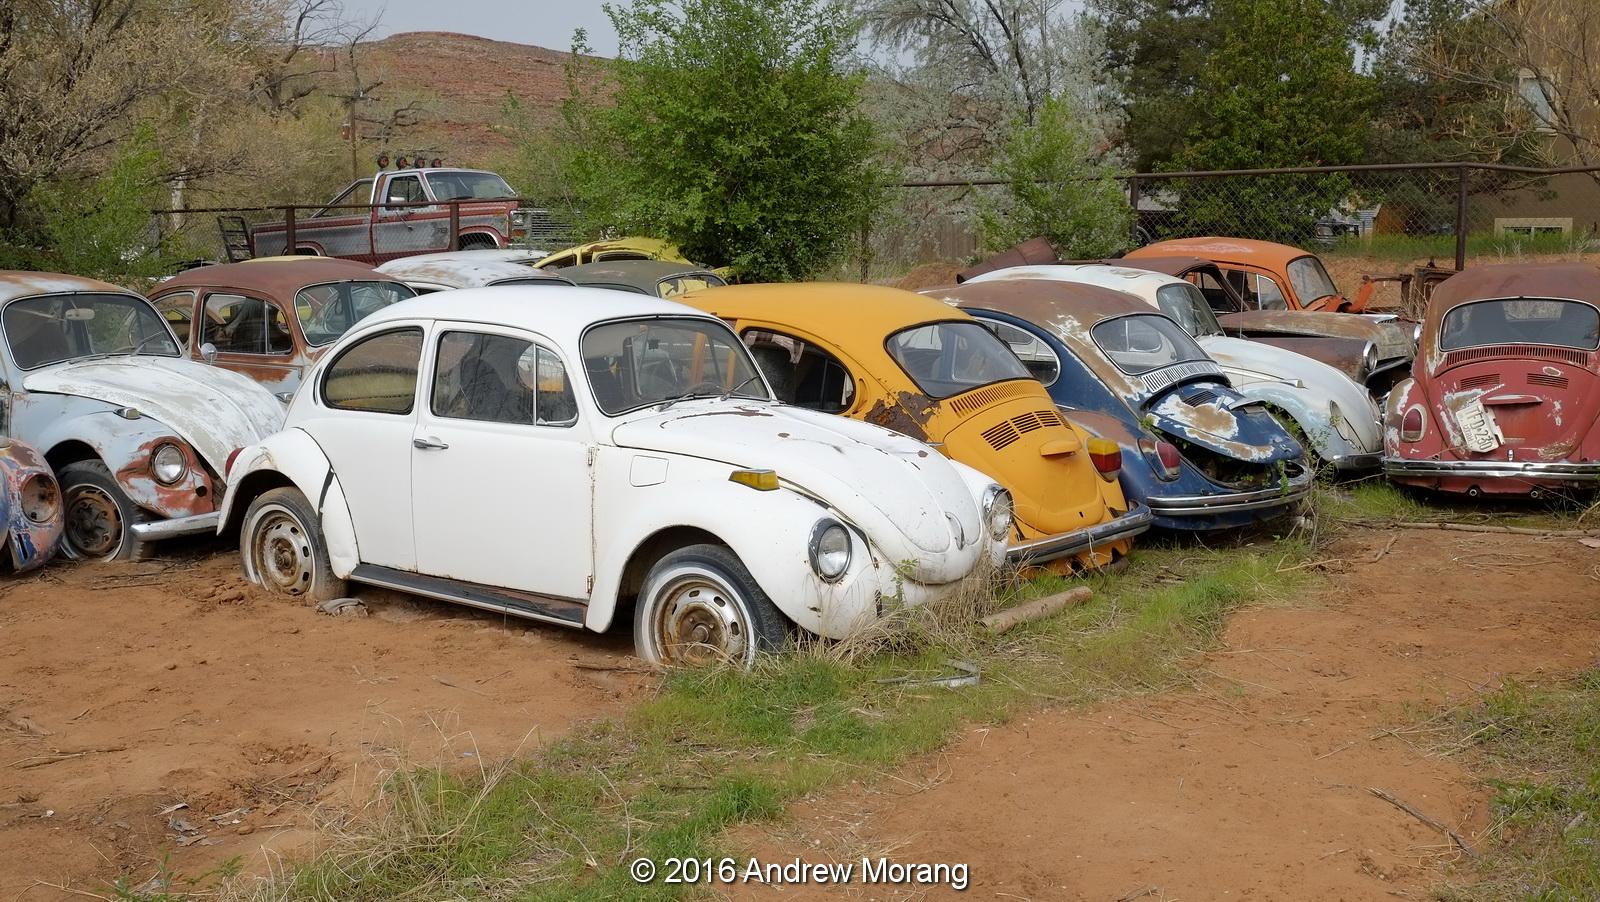 utah doublecab transporter association show vw car nation classic tag volkswagen vdub